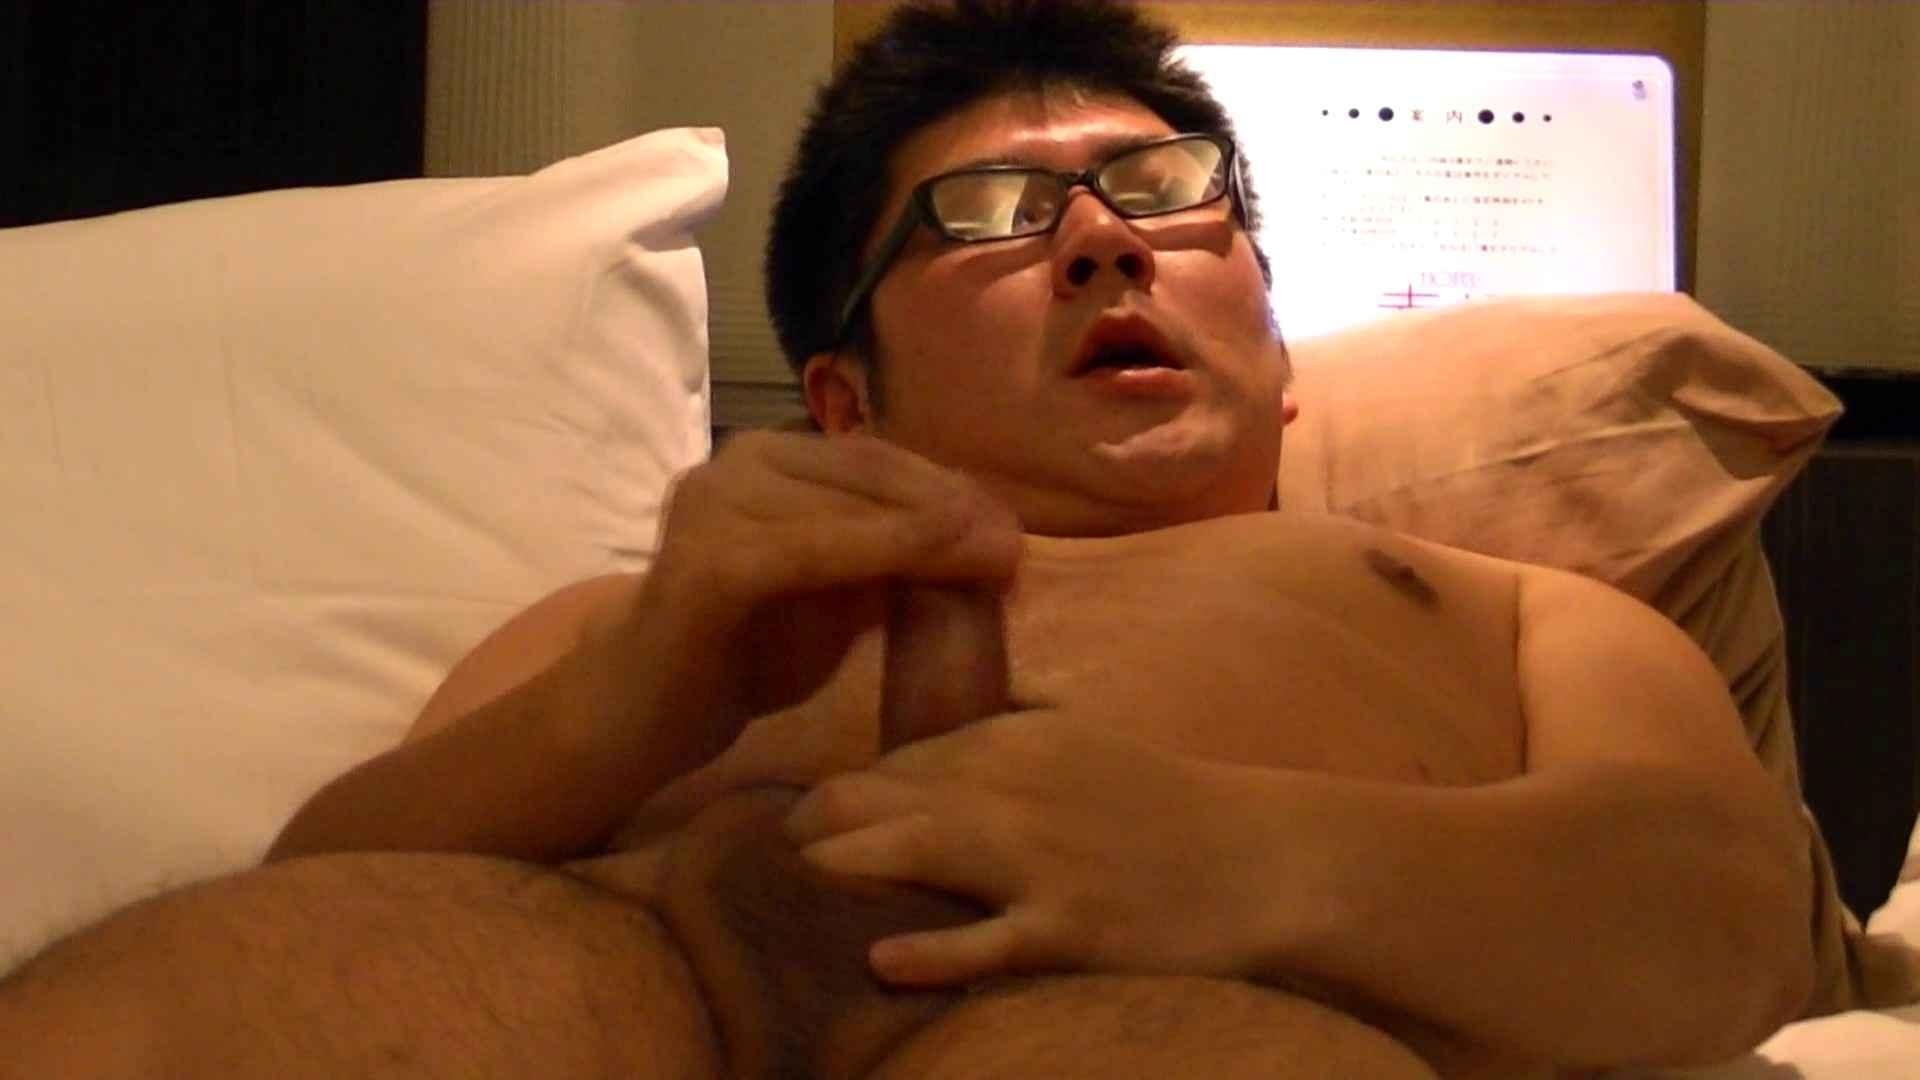 Mr.オナックスさん投稿!HD 貴方のオナニー三万円で撮影させてください。VOL.03 後編 完全無修正でお届け | オナニー特集  83pic 6